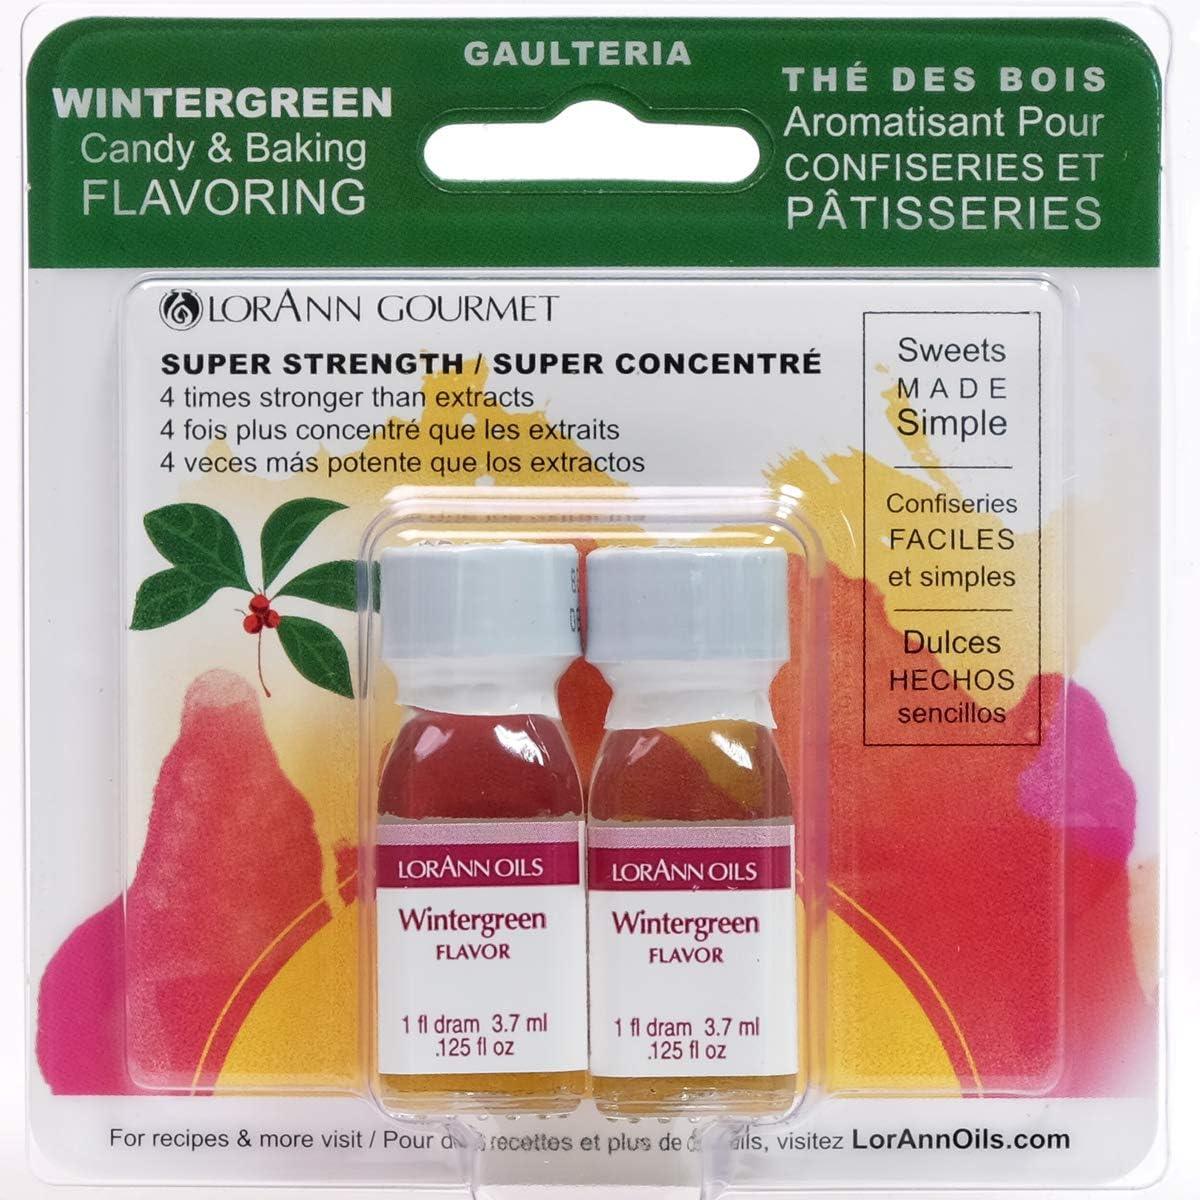 LorAnn Wintergreen Super Strength Flavor, 1 dram bottle (.0125 fl oz - 3.7ml) - Twin Pack Blistered